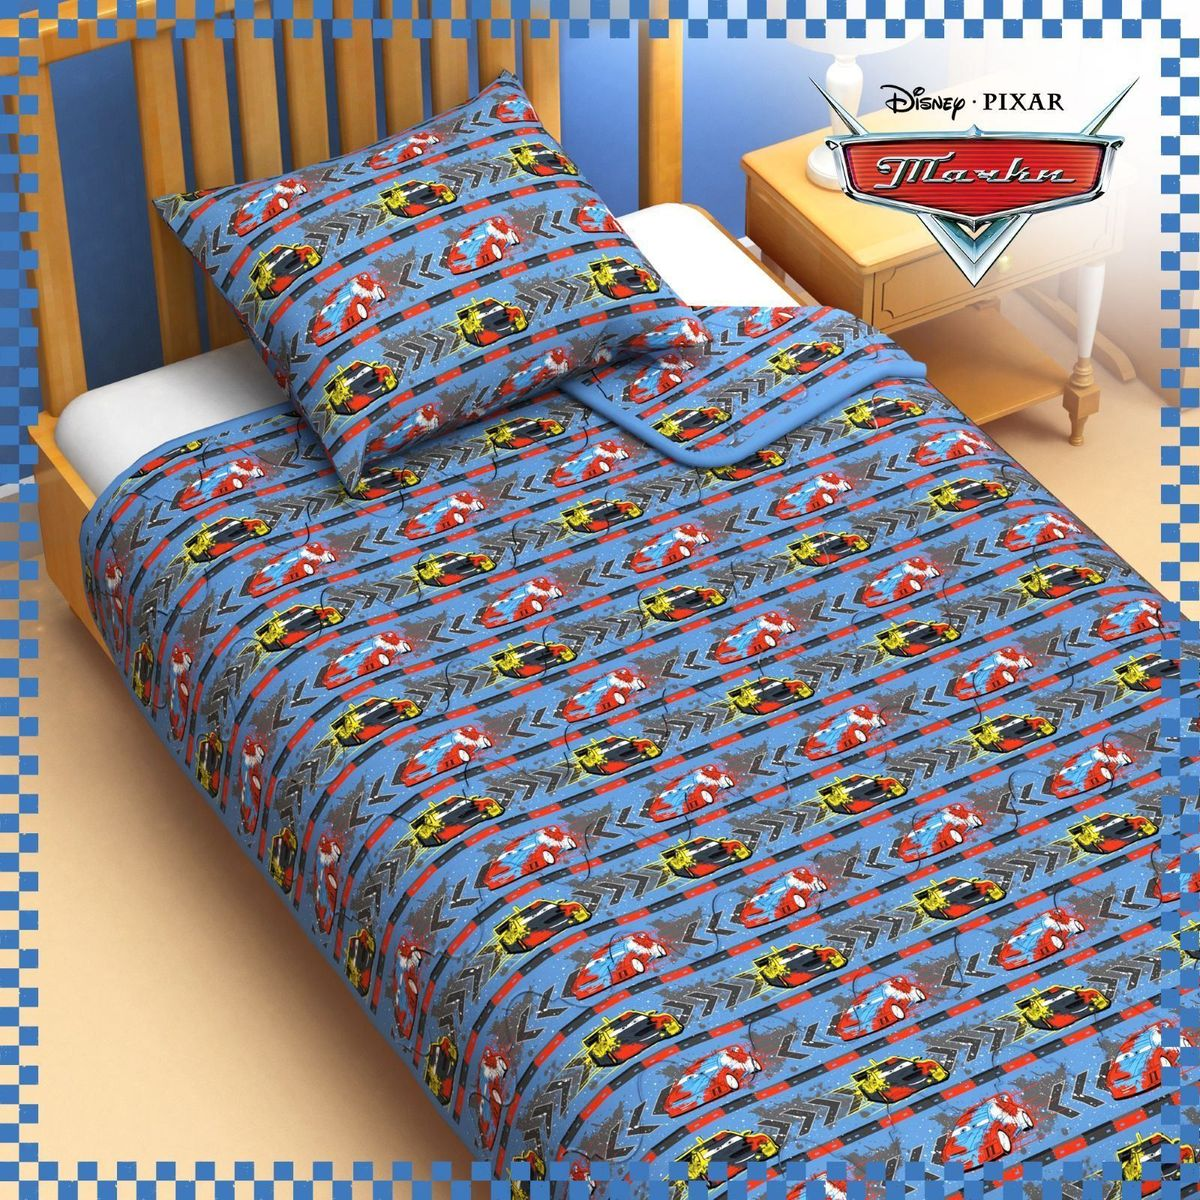 Disney Одеяло 1,5 спальное Тачки 140 х 205 см 1153172 - Детский текстиль